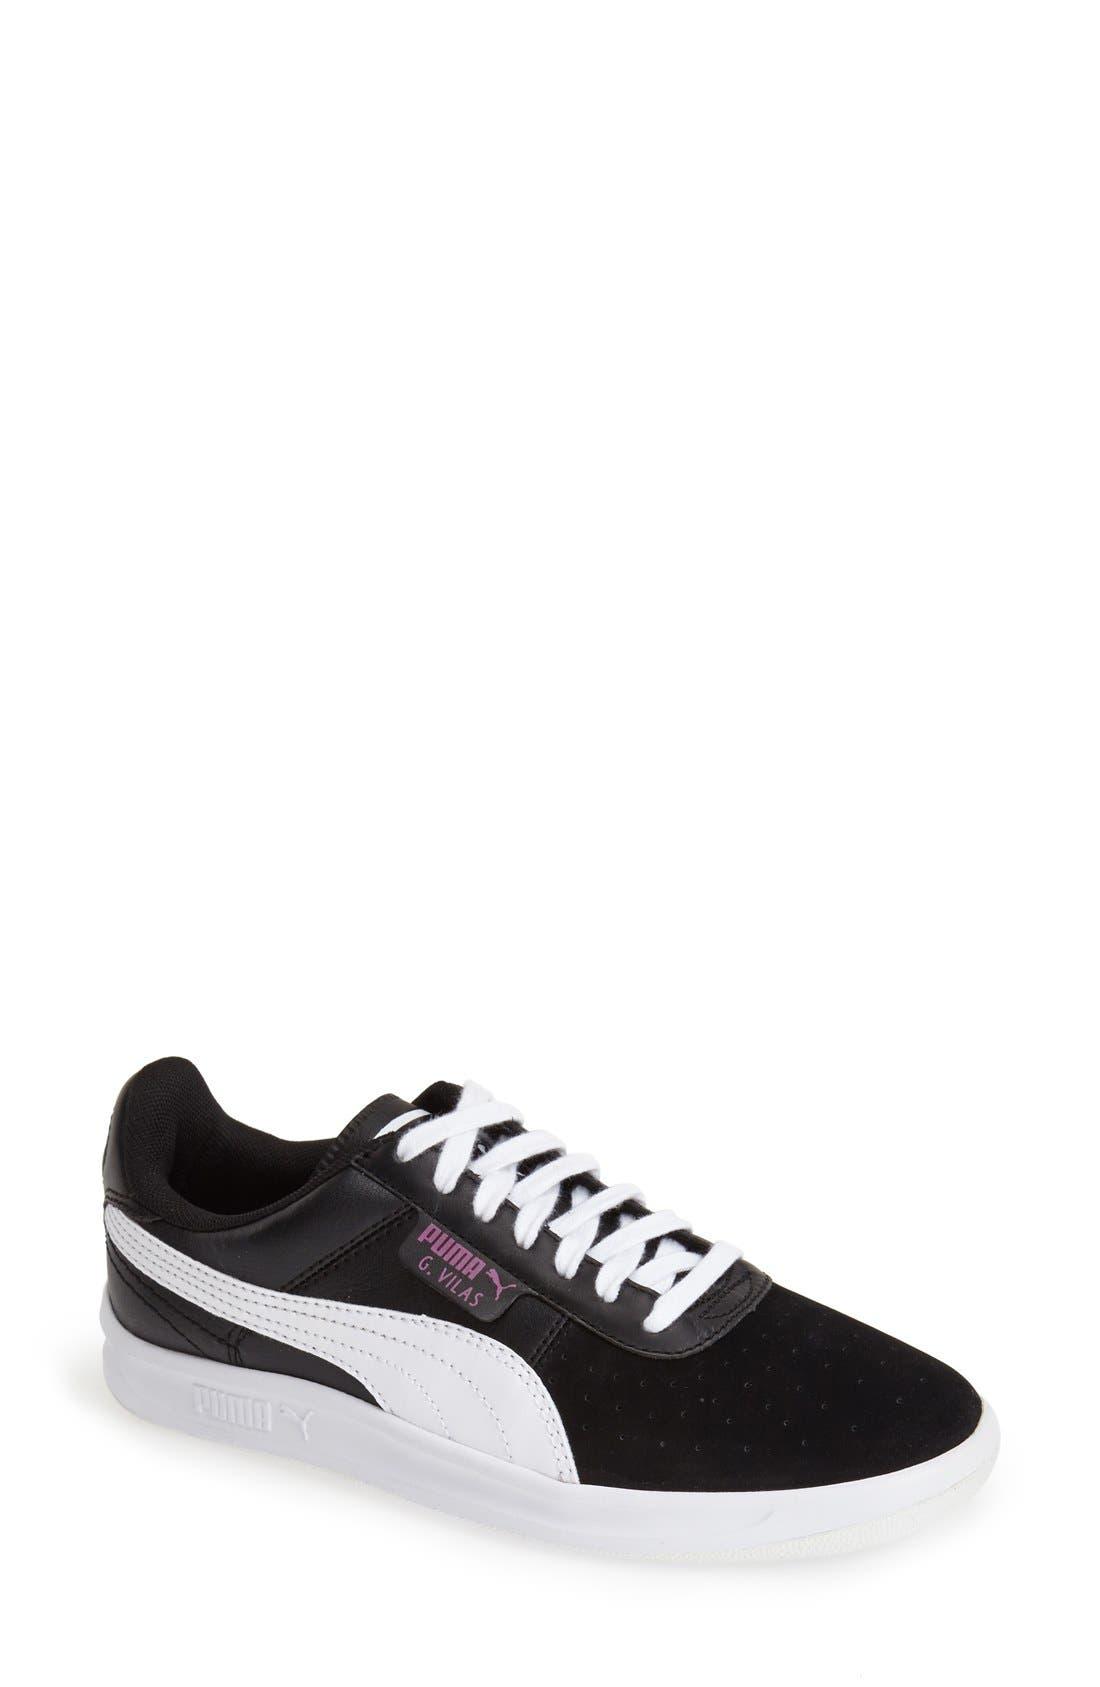 Main Image - PUMA 'G. Vilas - Basic Sport' Sneaker (Women)